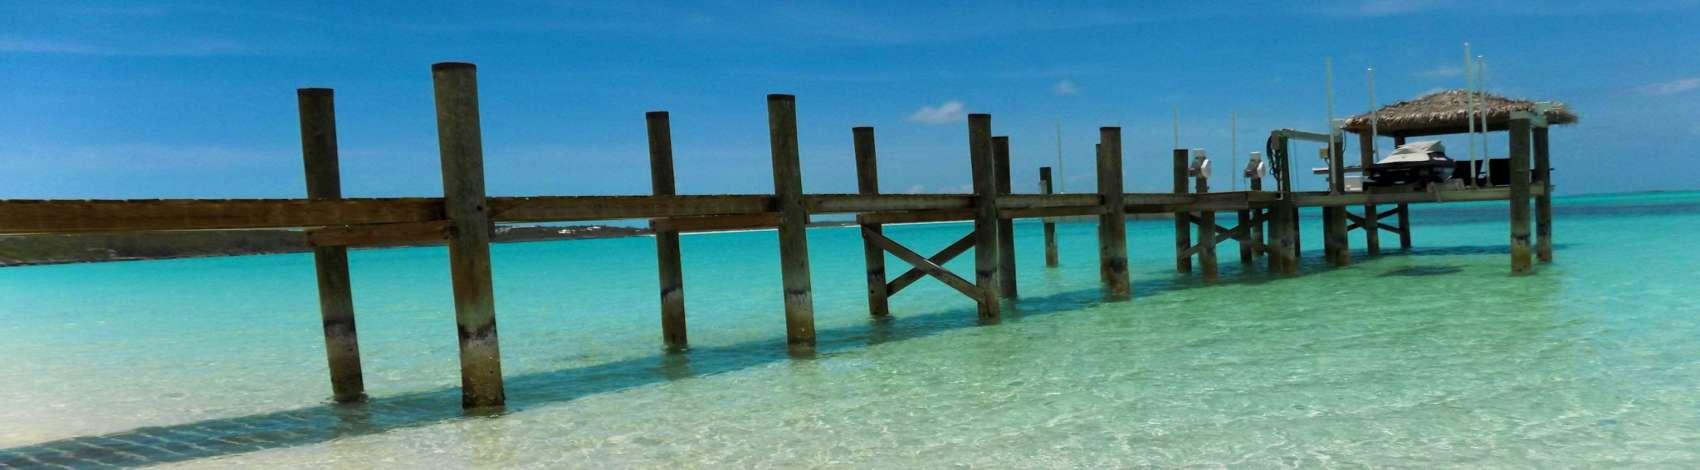 BahamasDock (2)